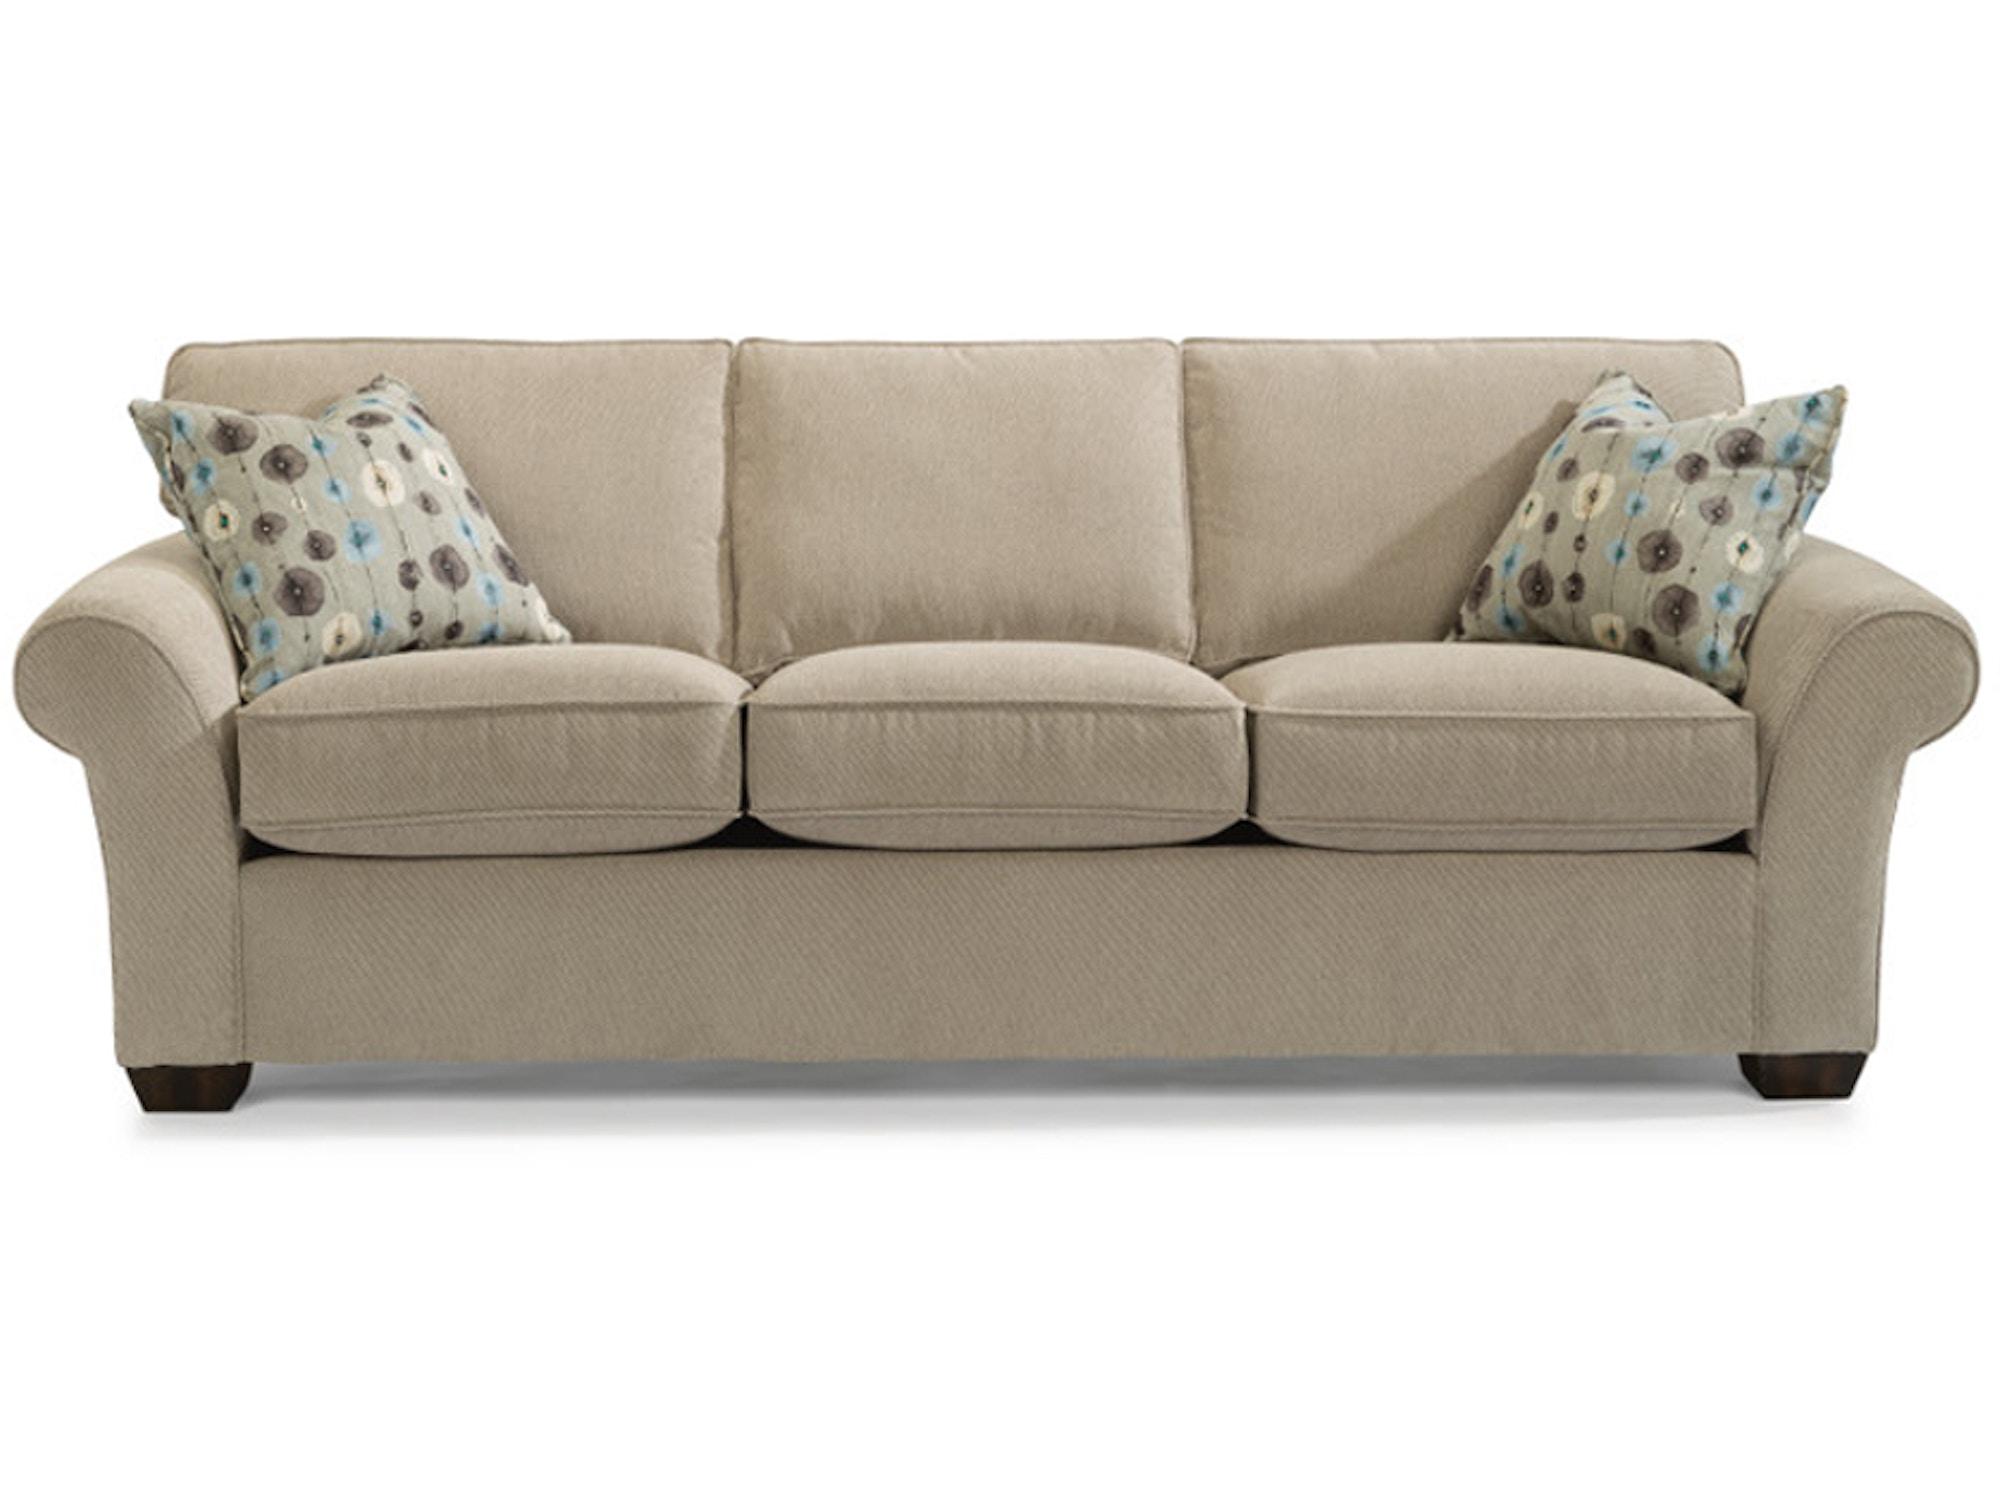 Flex steel sofas holly sofa flexsteel frontroom for Frontroom furniture